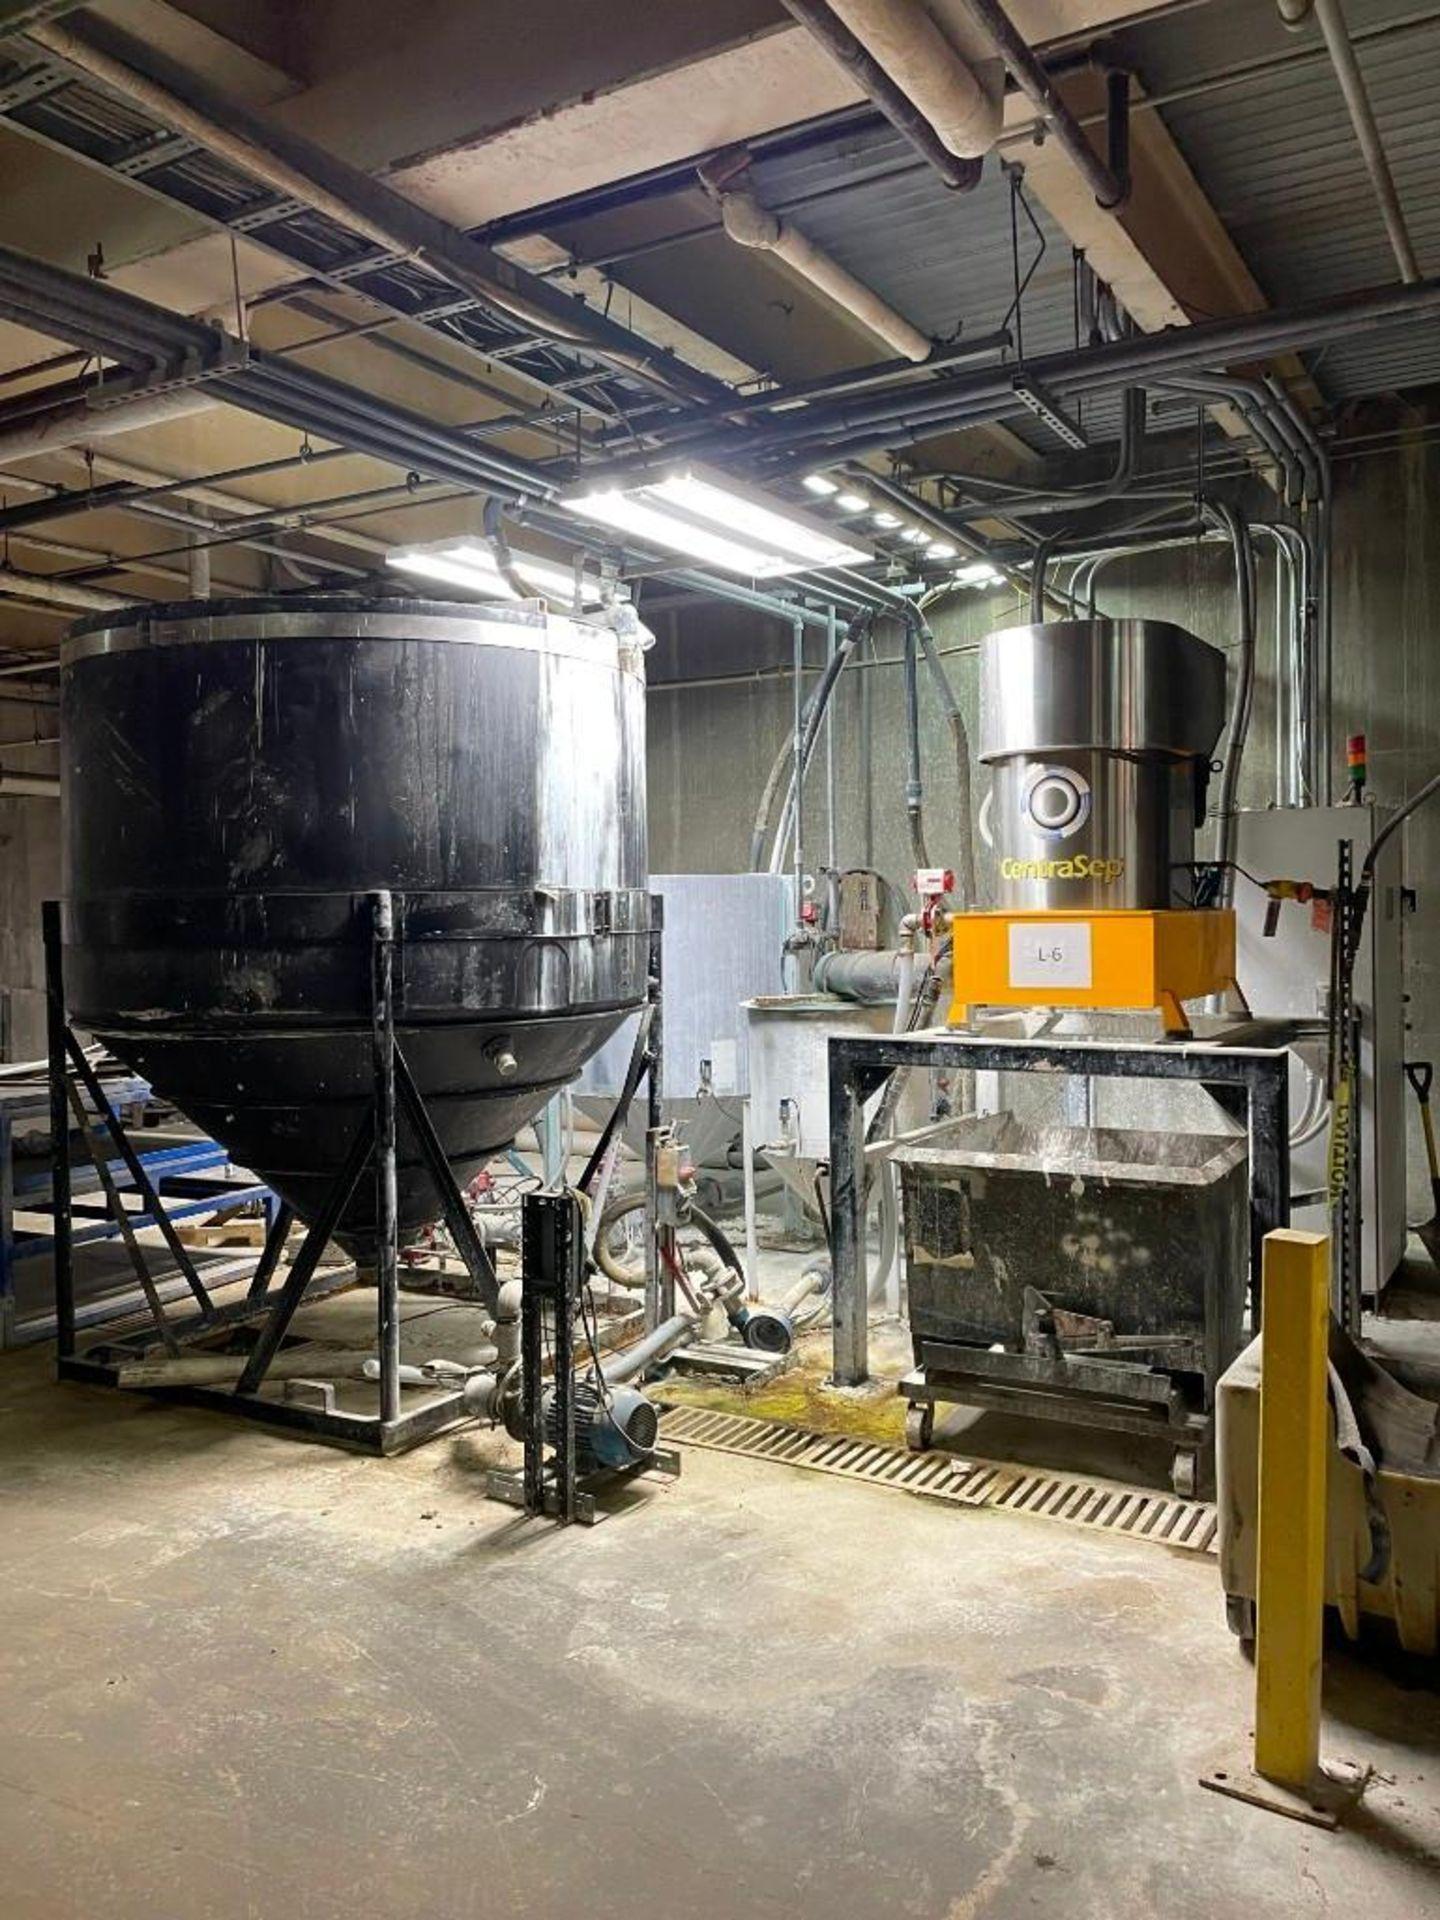 CentraSep Centrifugal Separation 3 Tank Filtration System